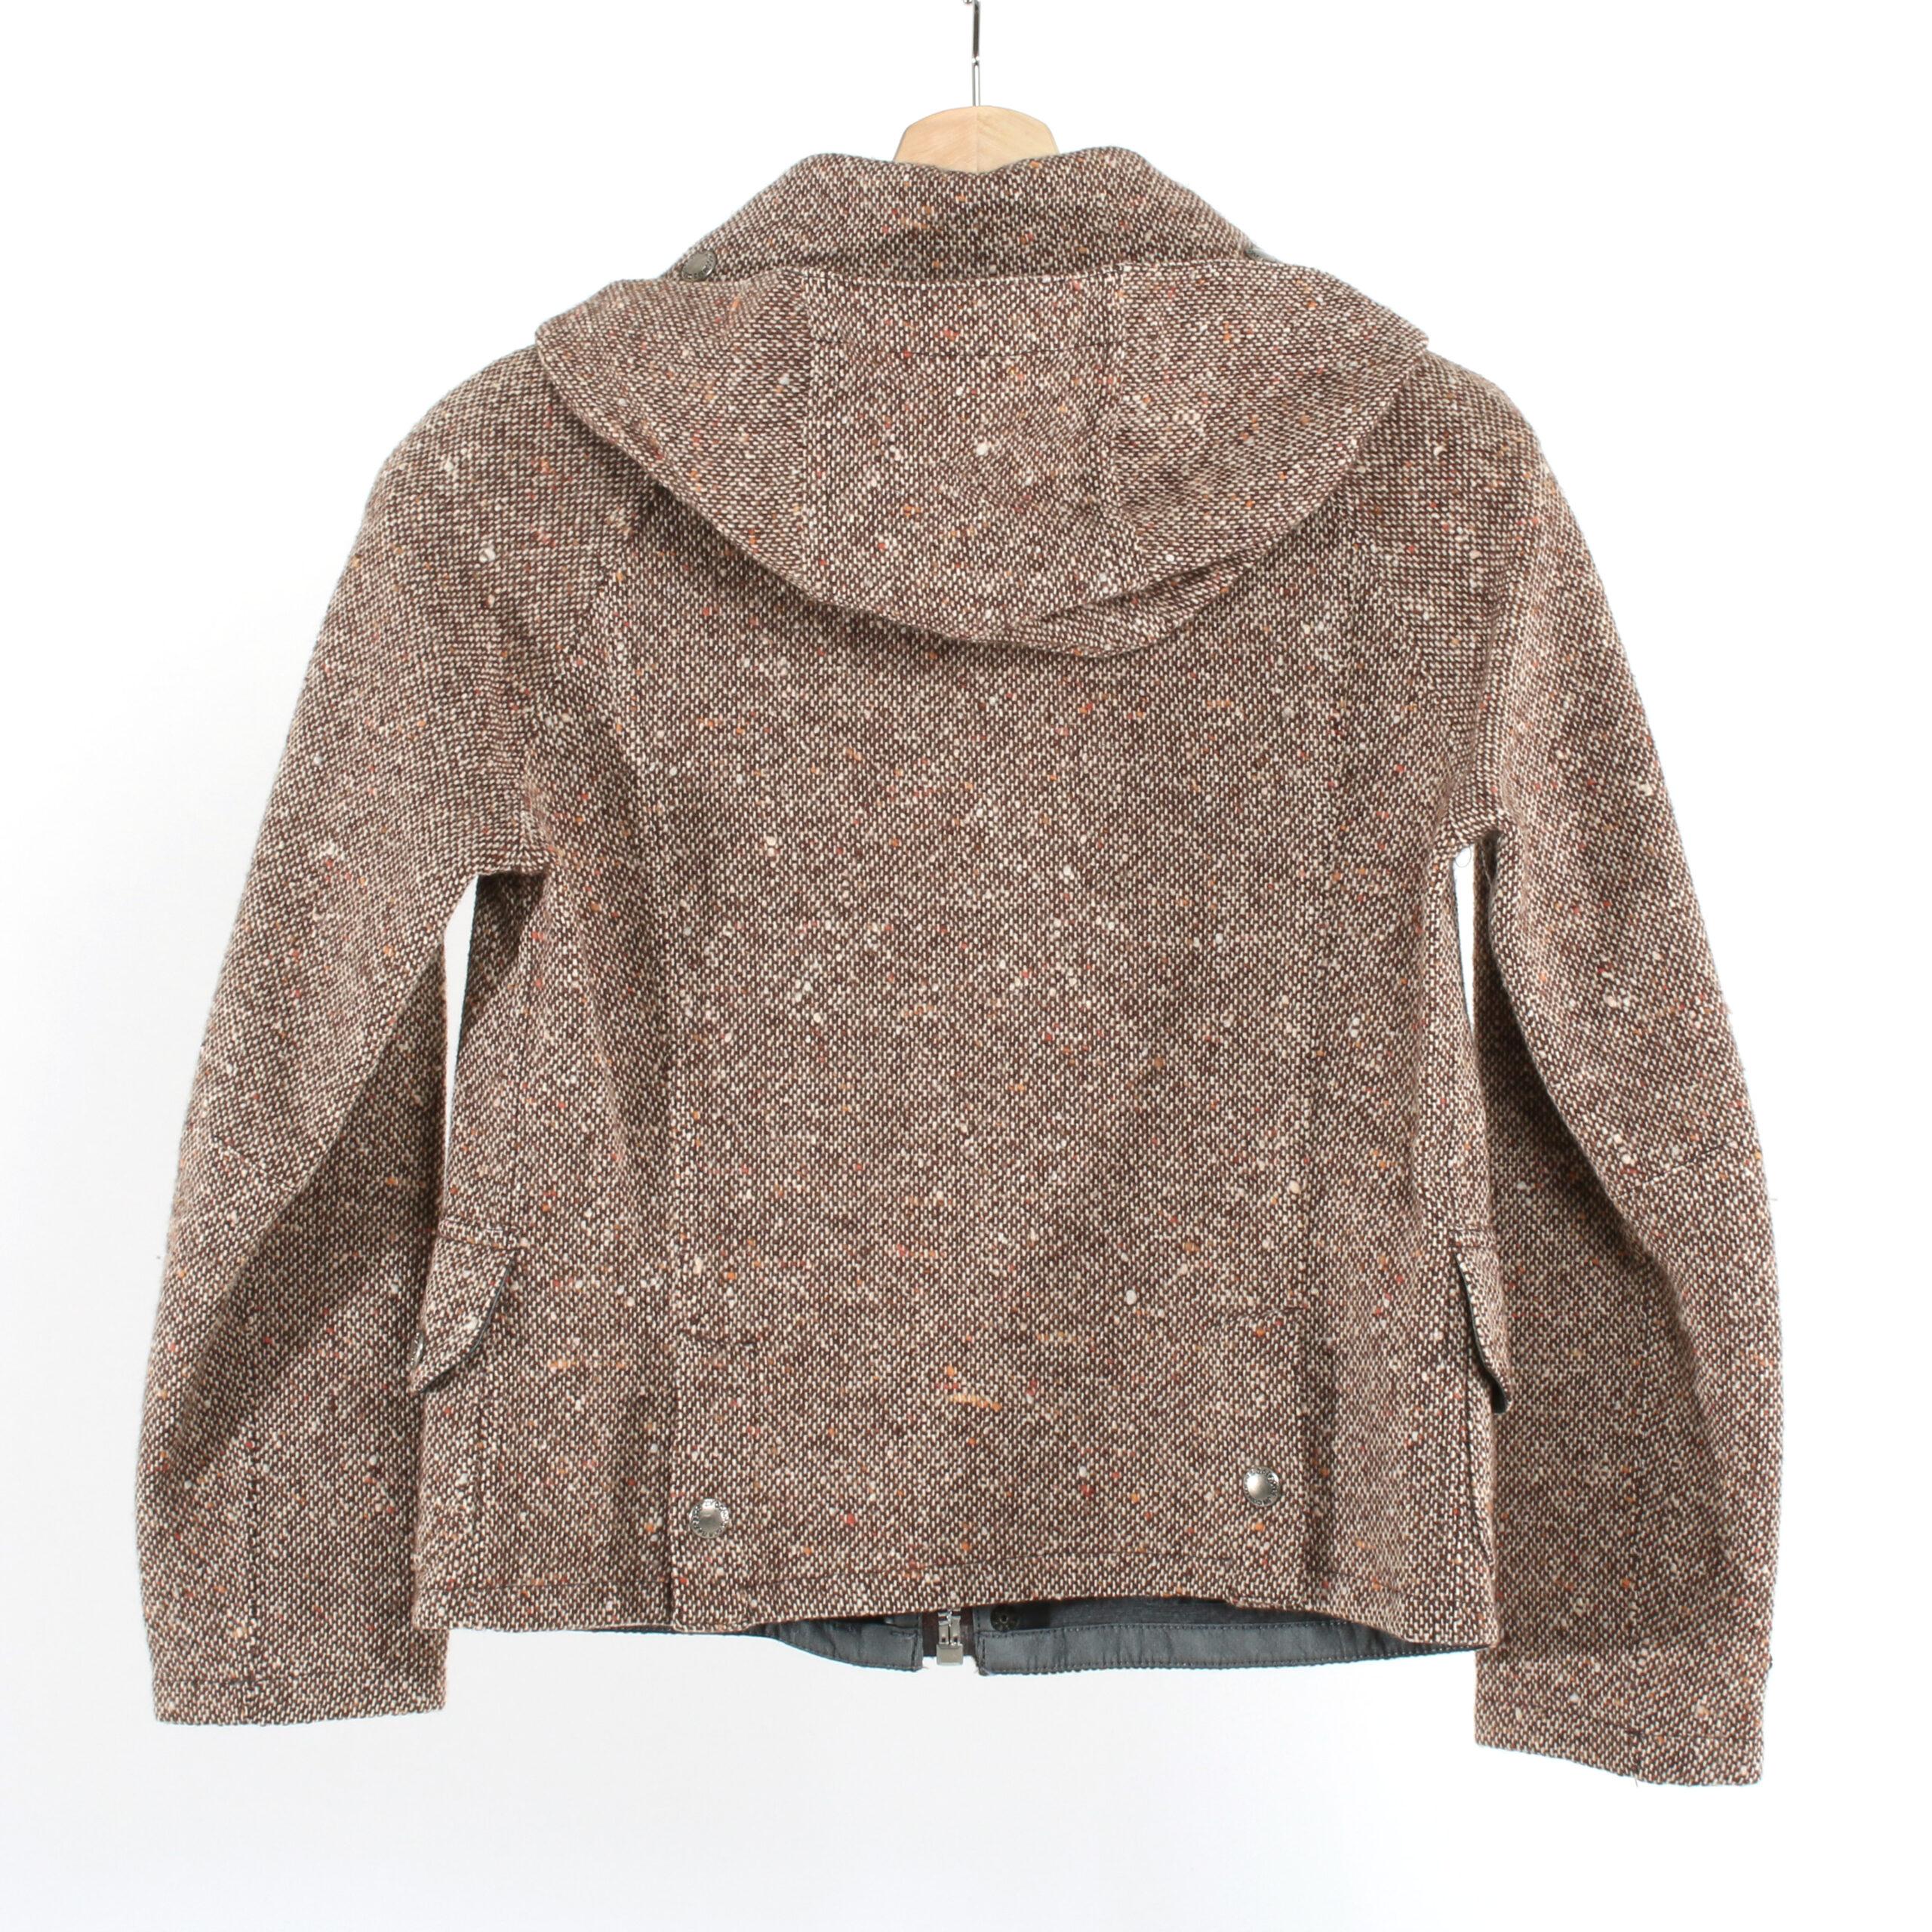 Junya Watanabe '01 JP015 Wool & Tapered Cargo Jacket